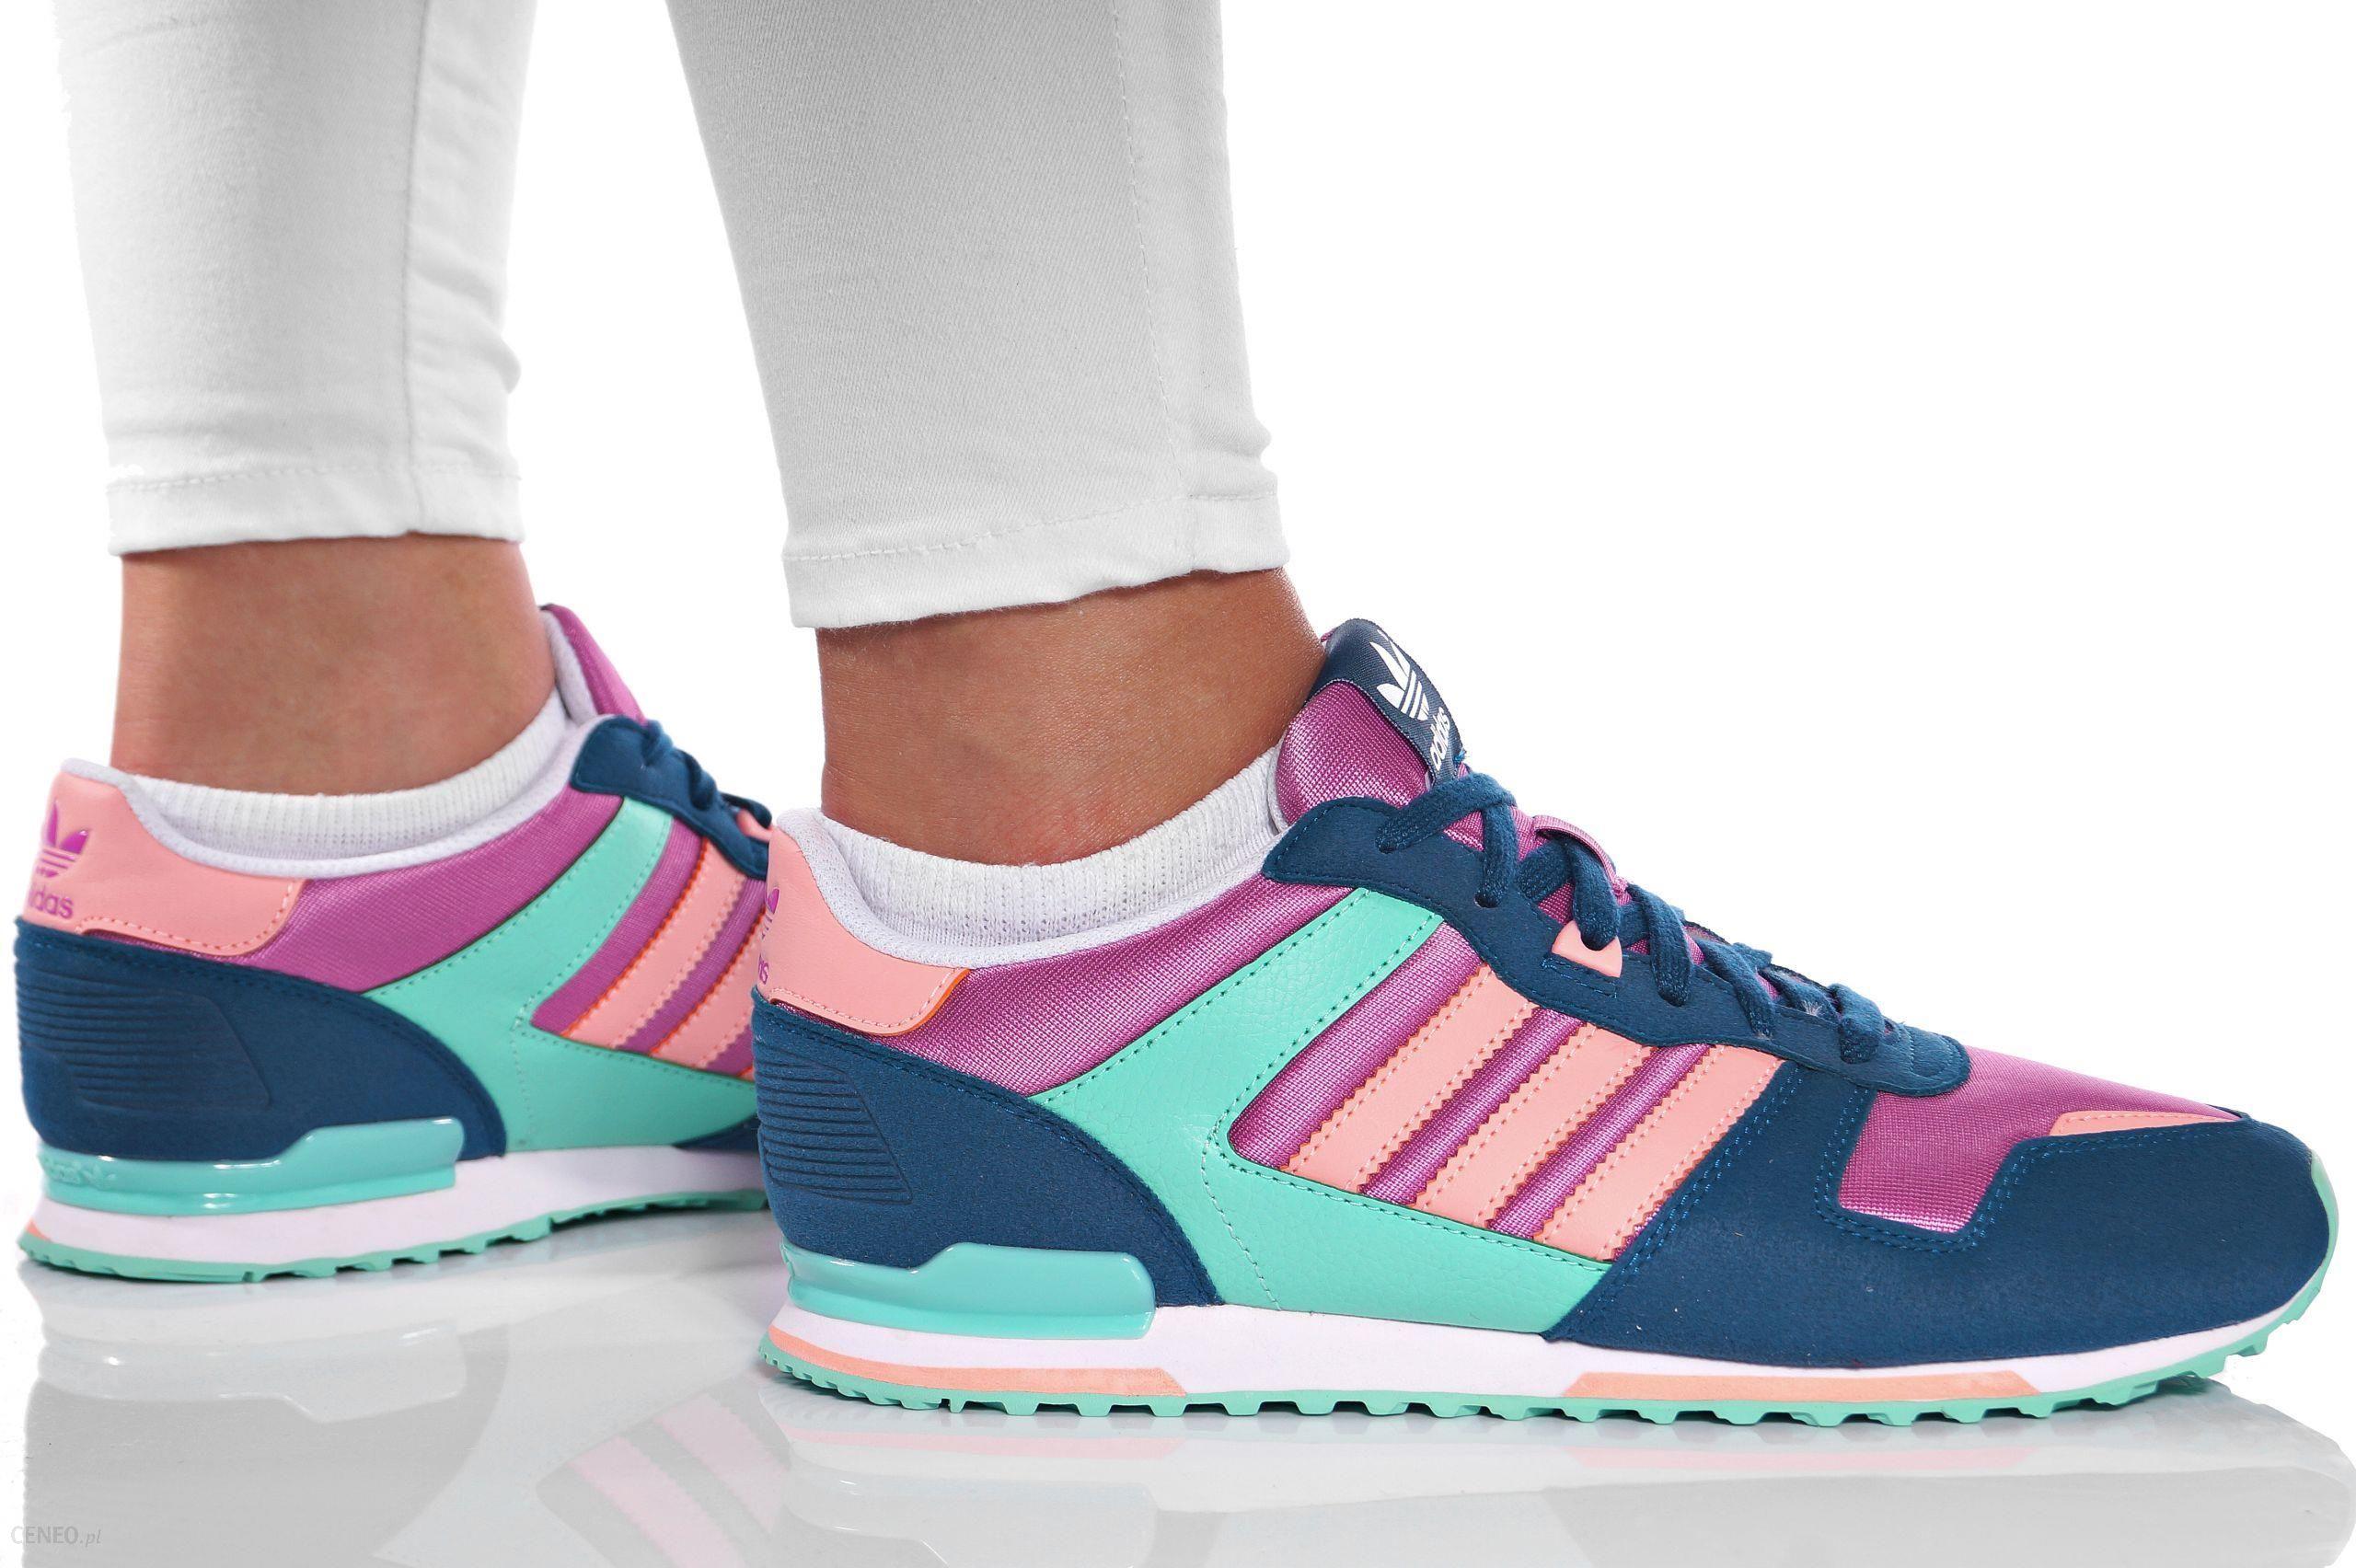 adidas zx 700 k q23982